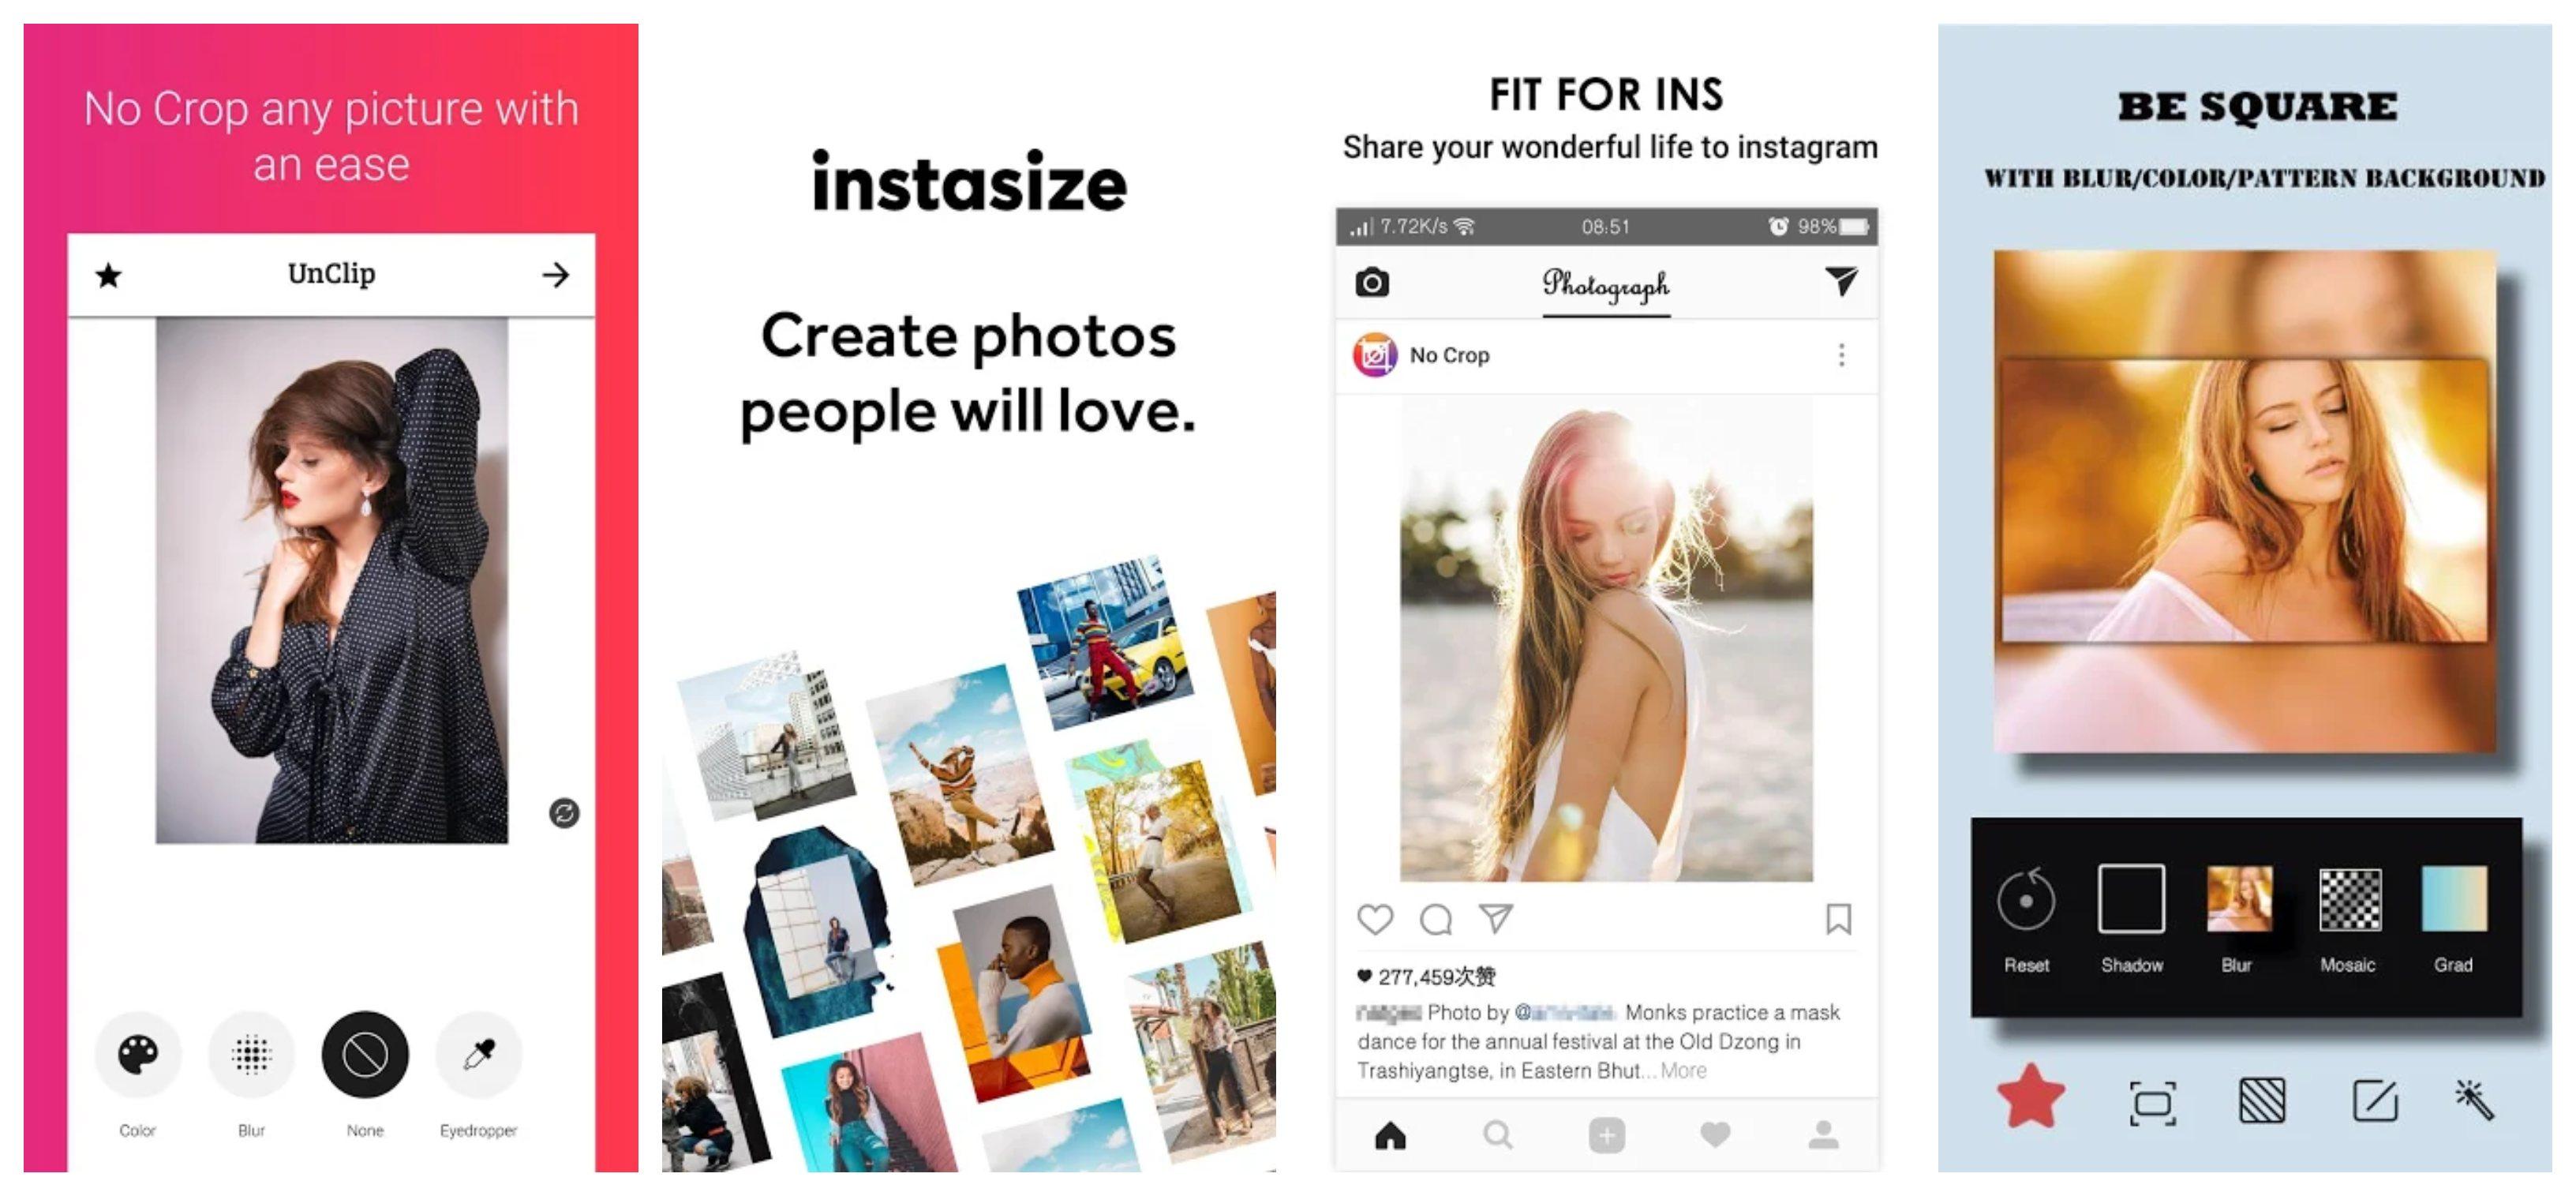 10 Best No Crop Apps For Instagram & WhatsApp (2019)